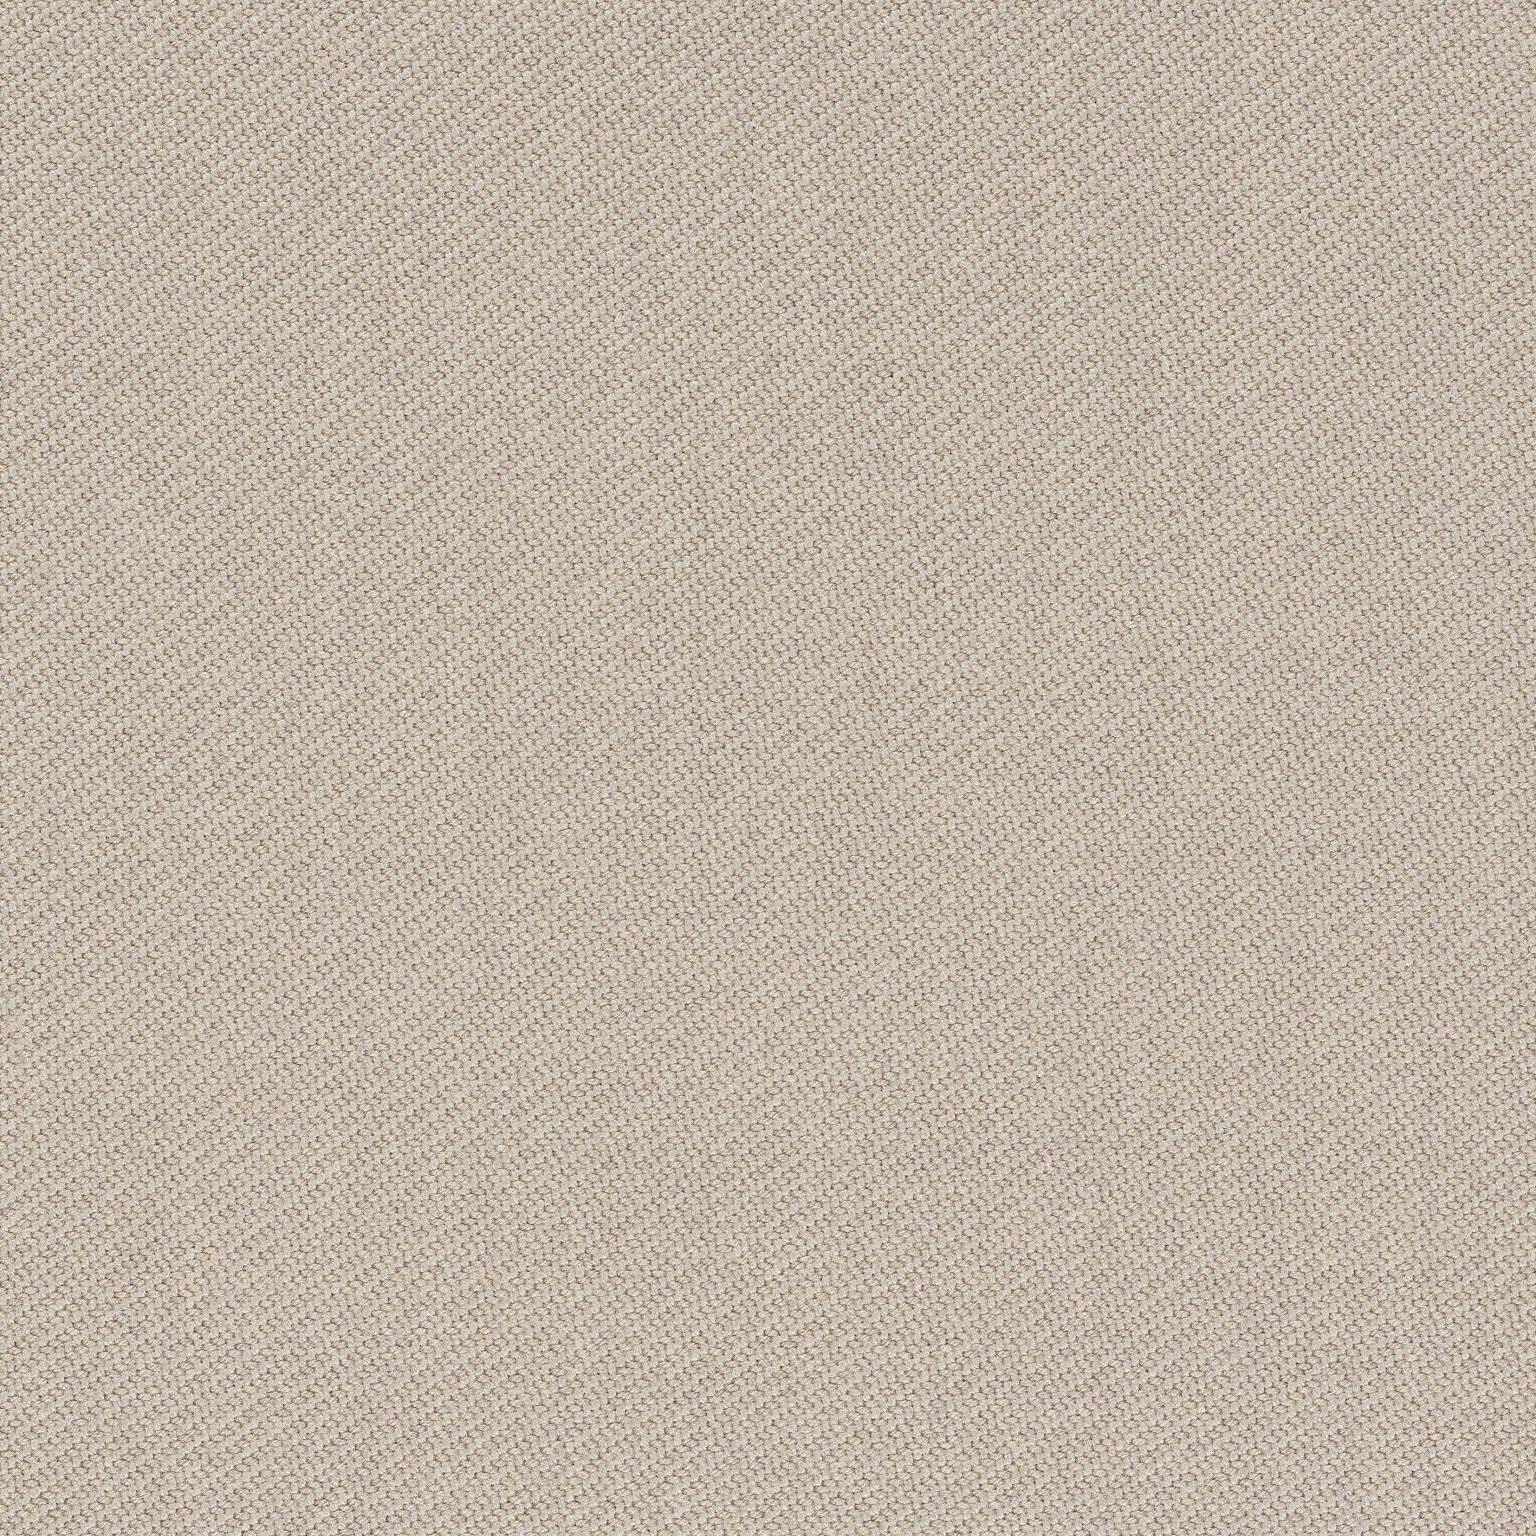 Kvadrat > Twill Weave 0230